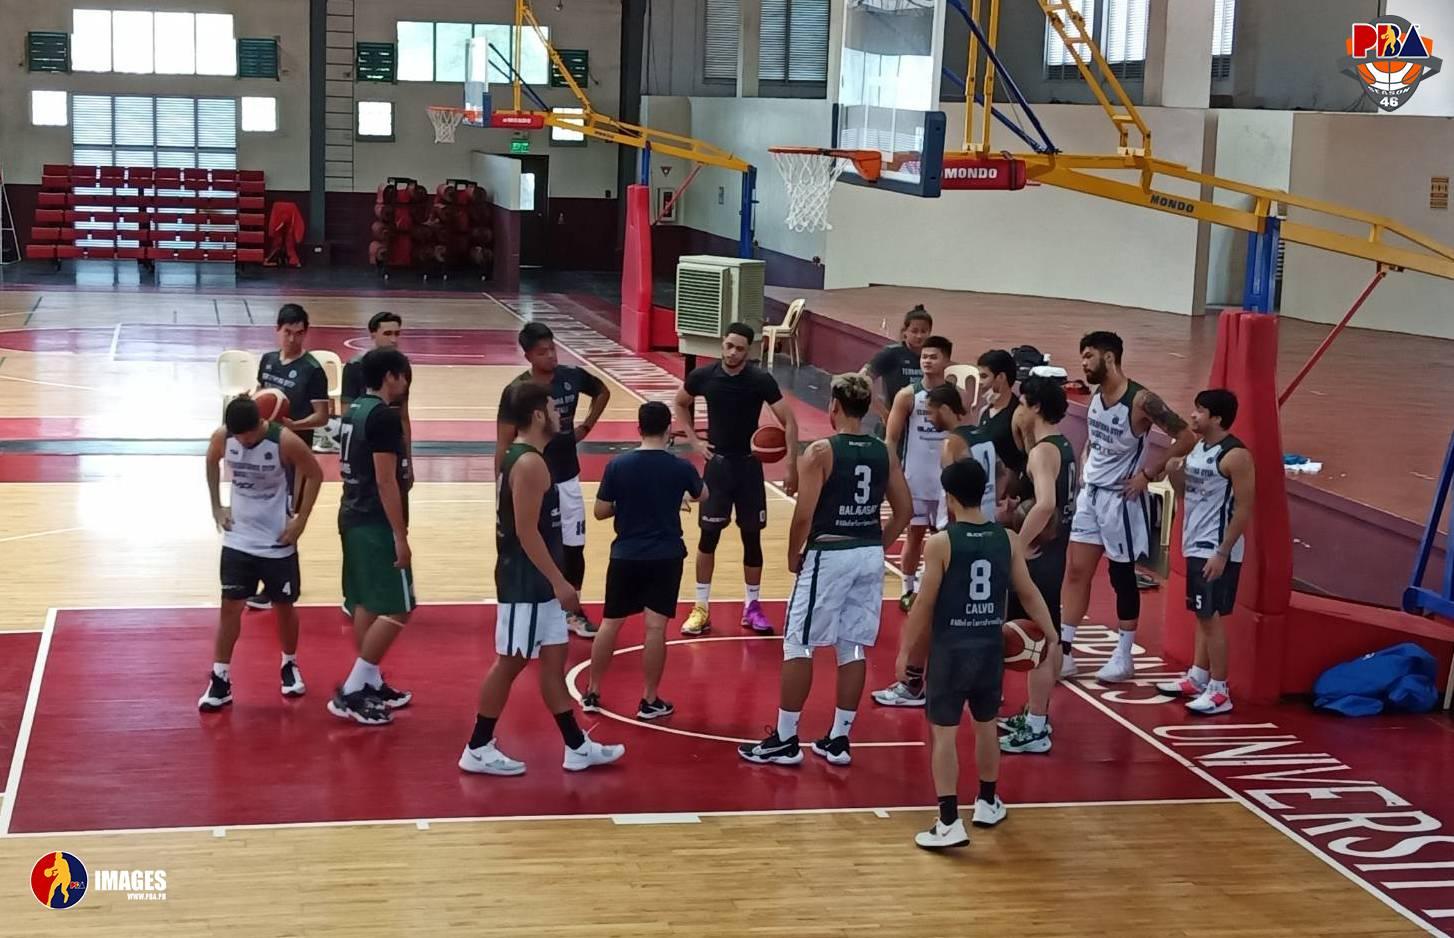 PBA-Season-46-Terrafirma-training Eight PBA teams begin Batangas circuit training Basketball News PBA  - philippine sports news